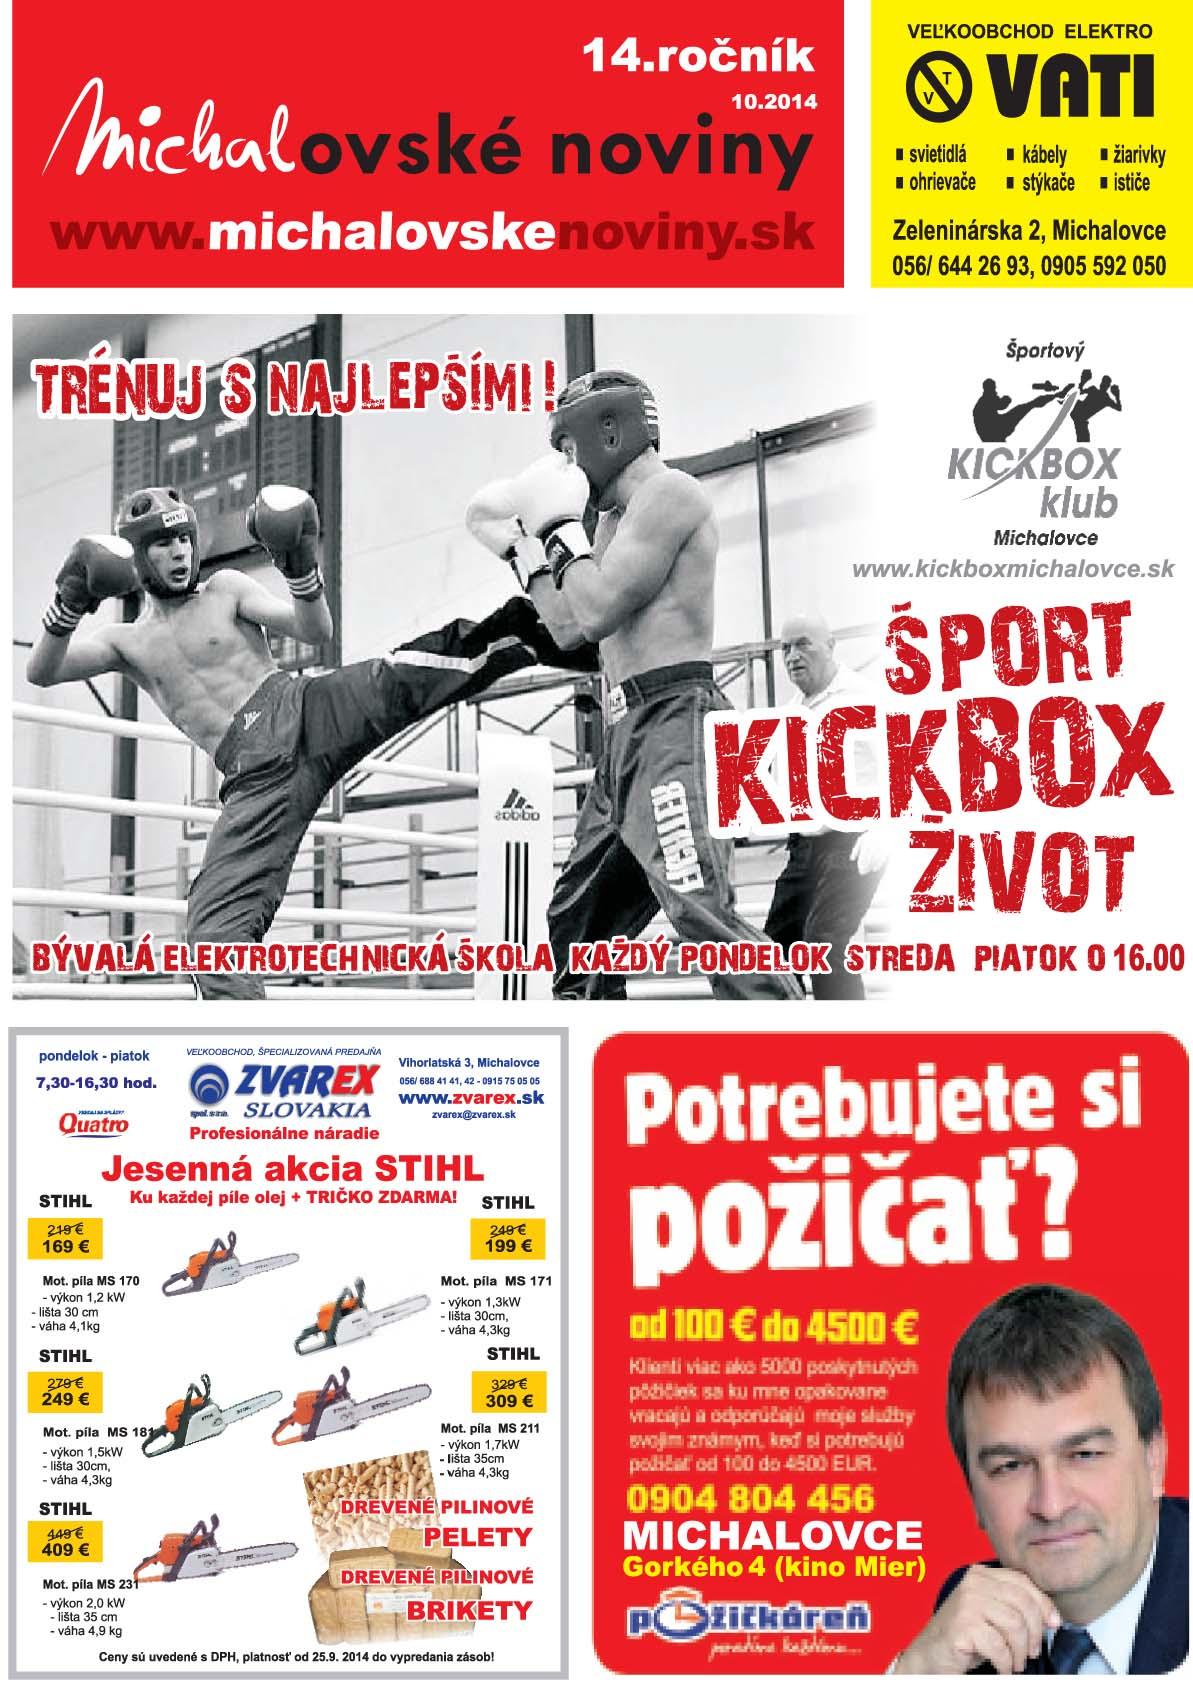 michalovske noviny oktober-1